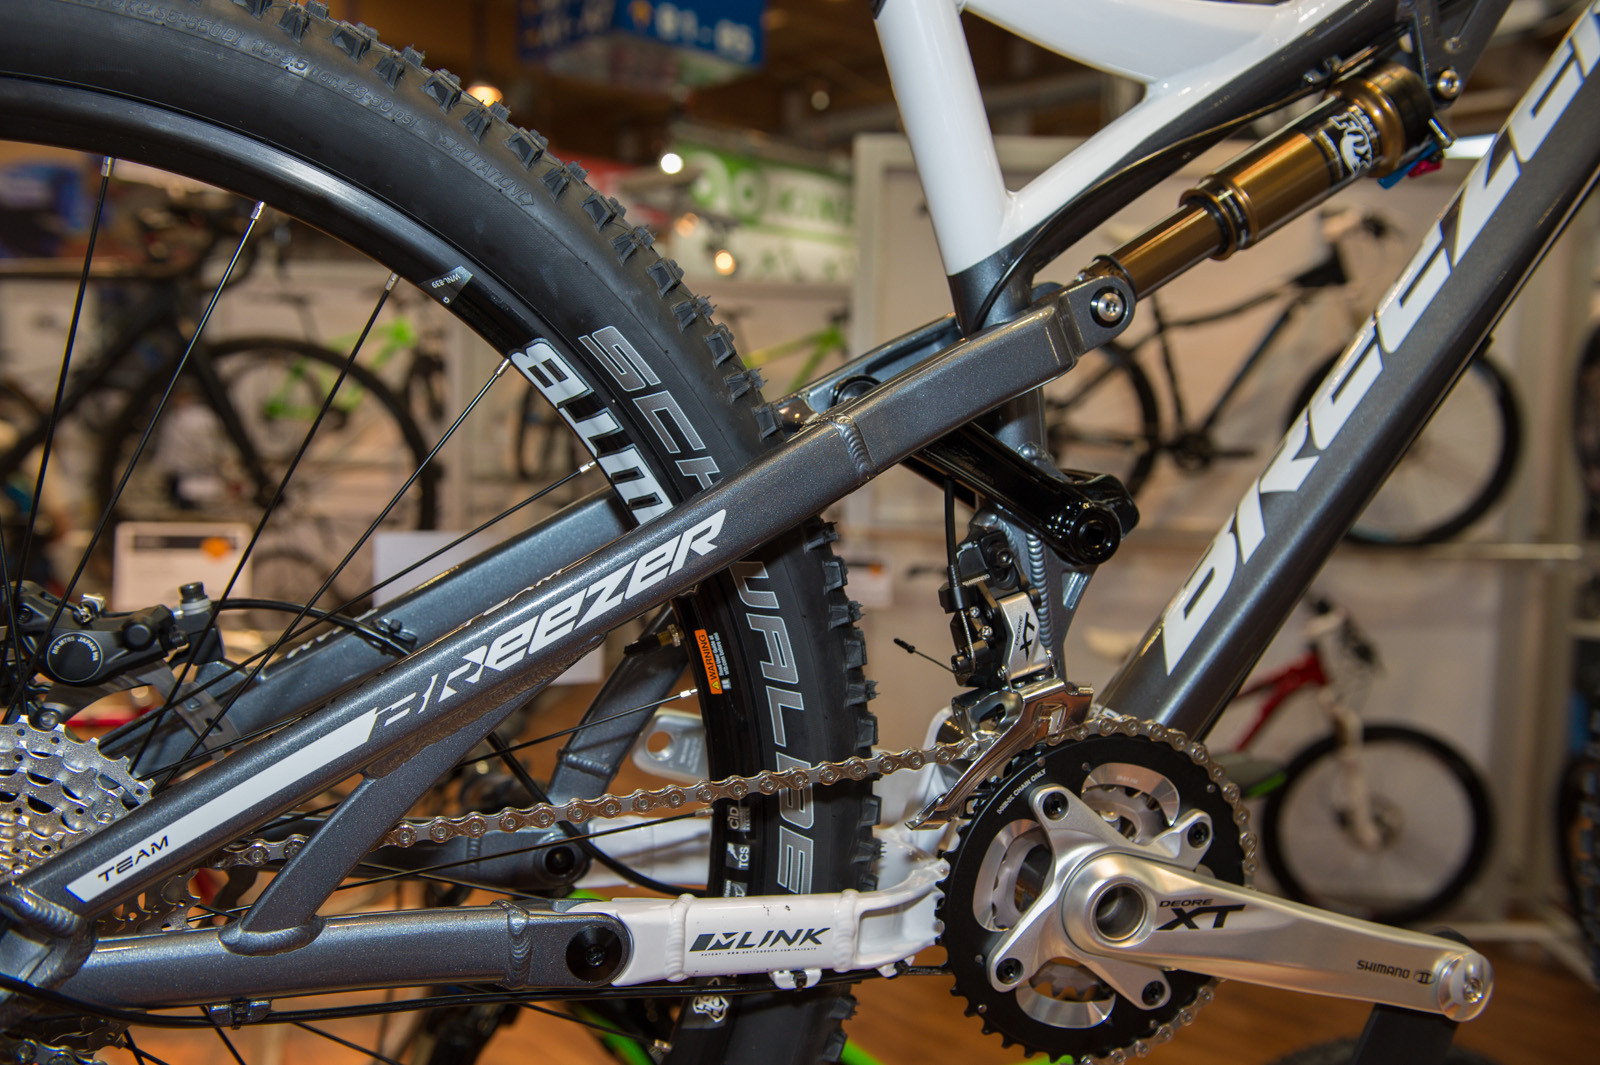 2014 Breezer Repack - 2014 Trail, All-Mountain & Enduro Bikes at Eurobike 2013 - Mountain Biking Pictures - Vital MTB